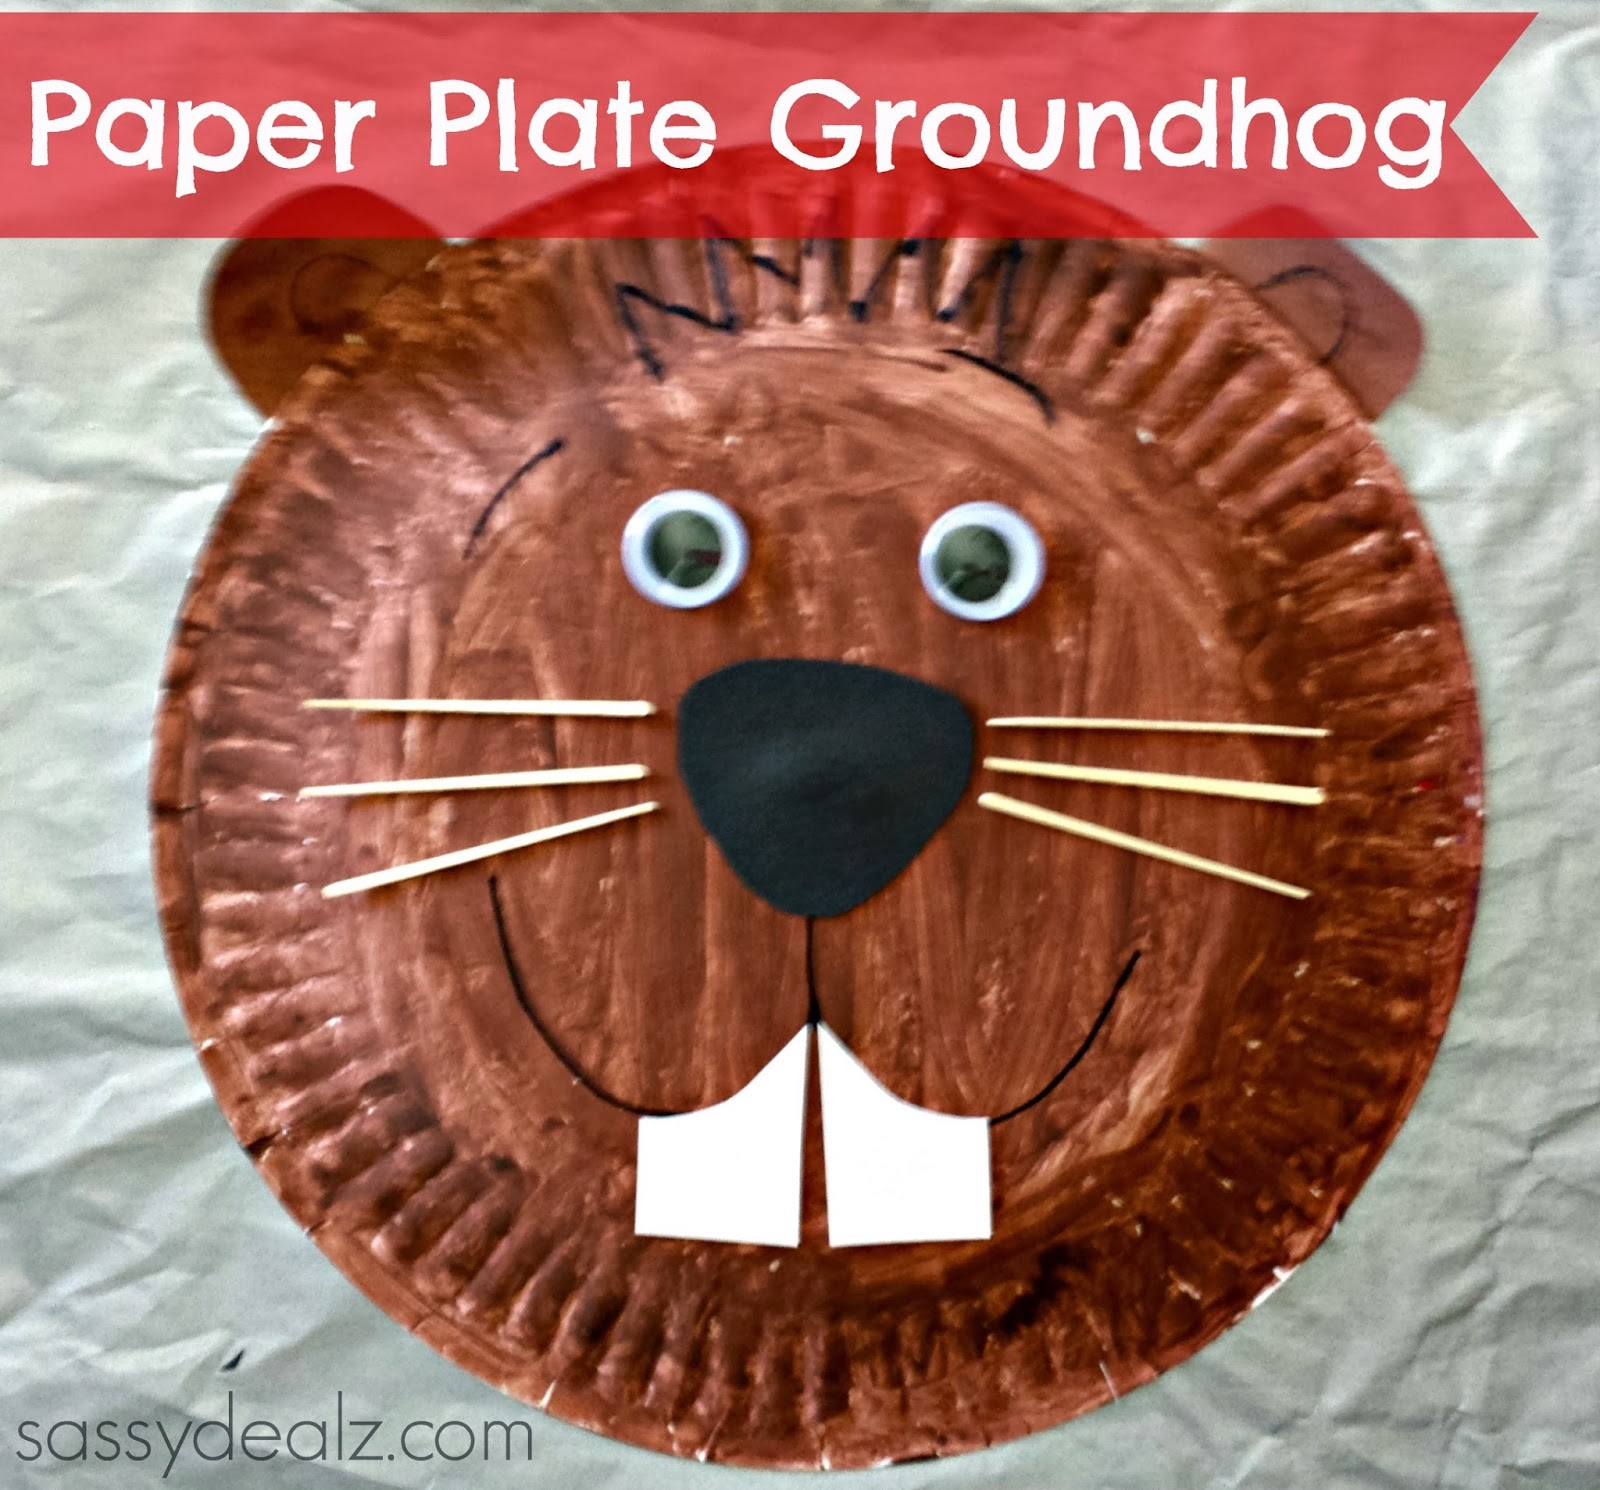 Groundhog Day Crafts For Kids Crafty Morning